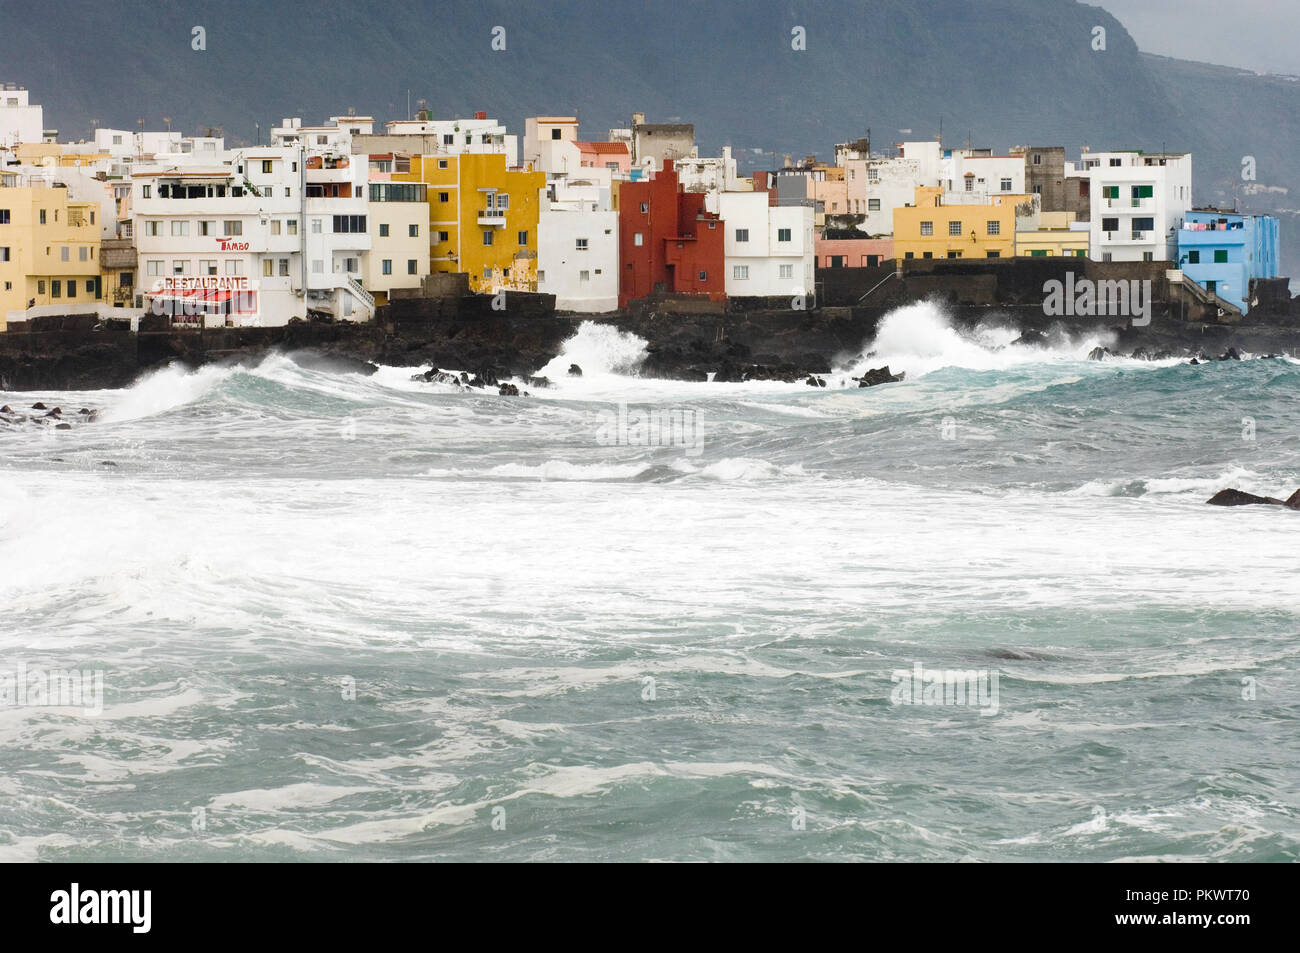 Stormy Weather In Puerto De La Cruz Tenerife Canary Islands Spain March 2006 Stock Photo Alamy